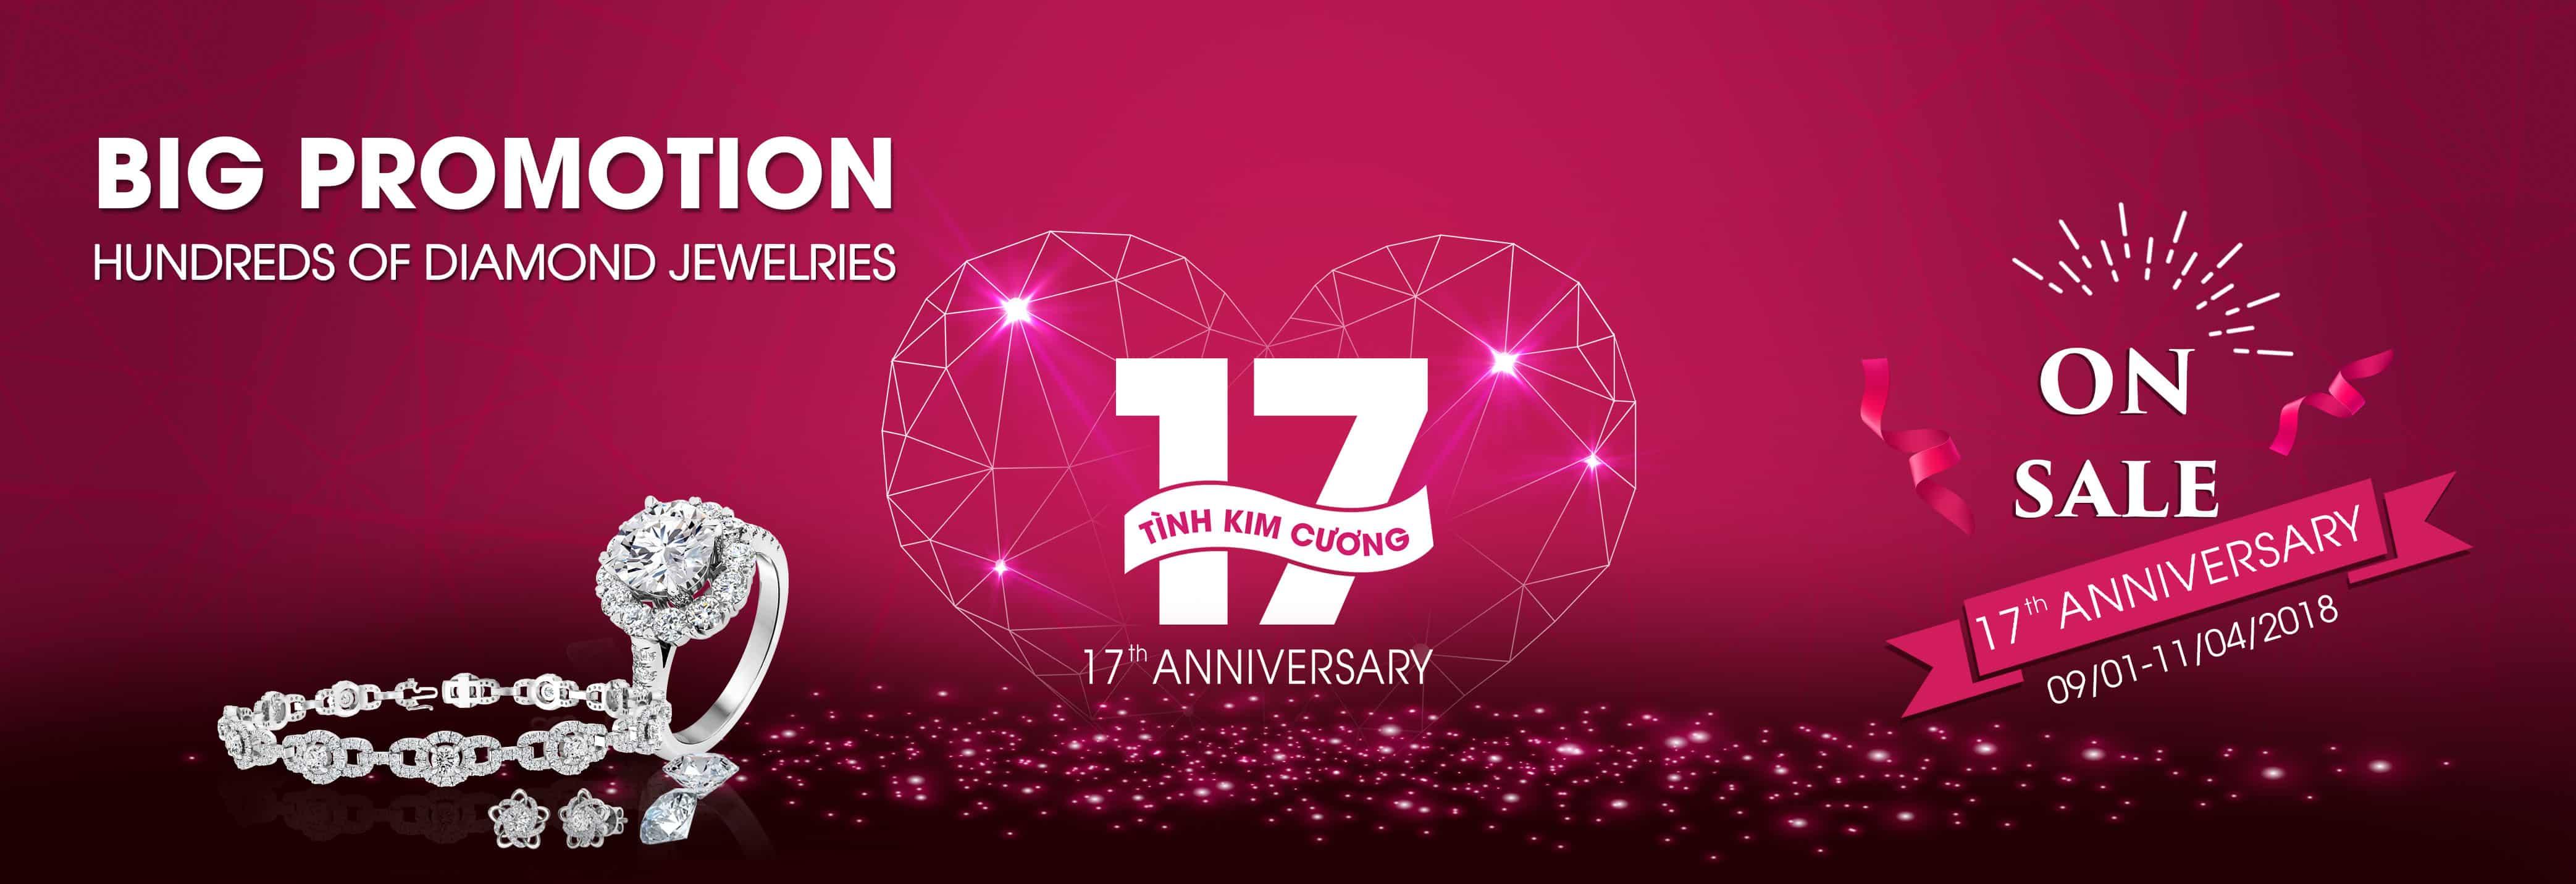 On-sale Anniversary 2018